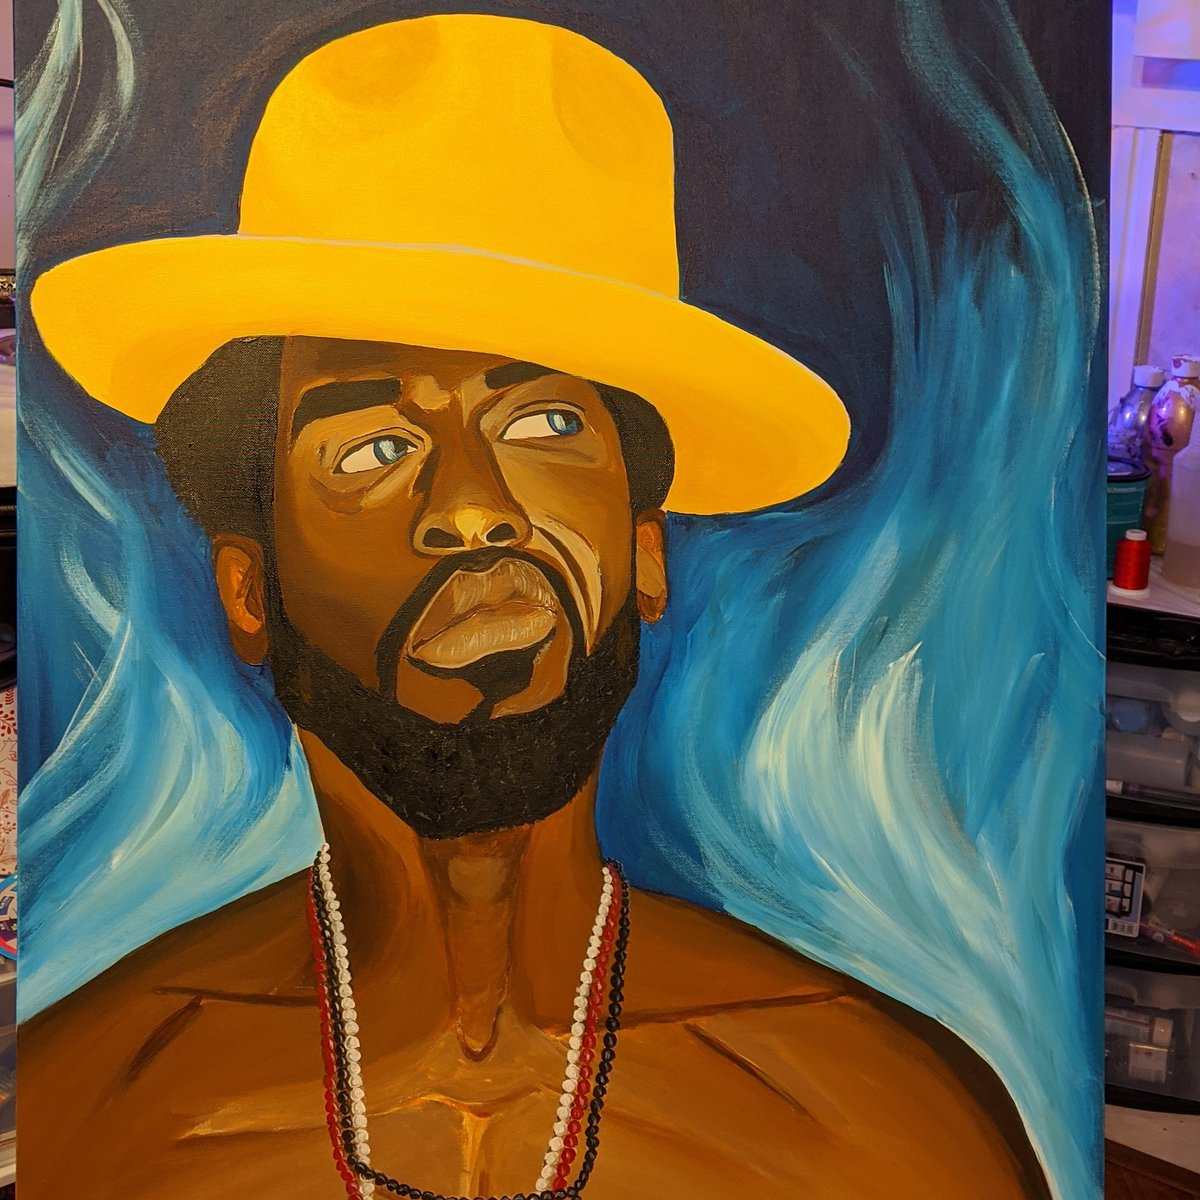 Little by little it's getting where it needs to be 30x40 acrylic on canvas #blackmen #melaninpoppin #masculineenergy #blackart #hatswag #beardgang #acrilicpainting #issaman #darkskin #mustafashakir #beads #elekespic.twitter.com/Md5xbCTND0